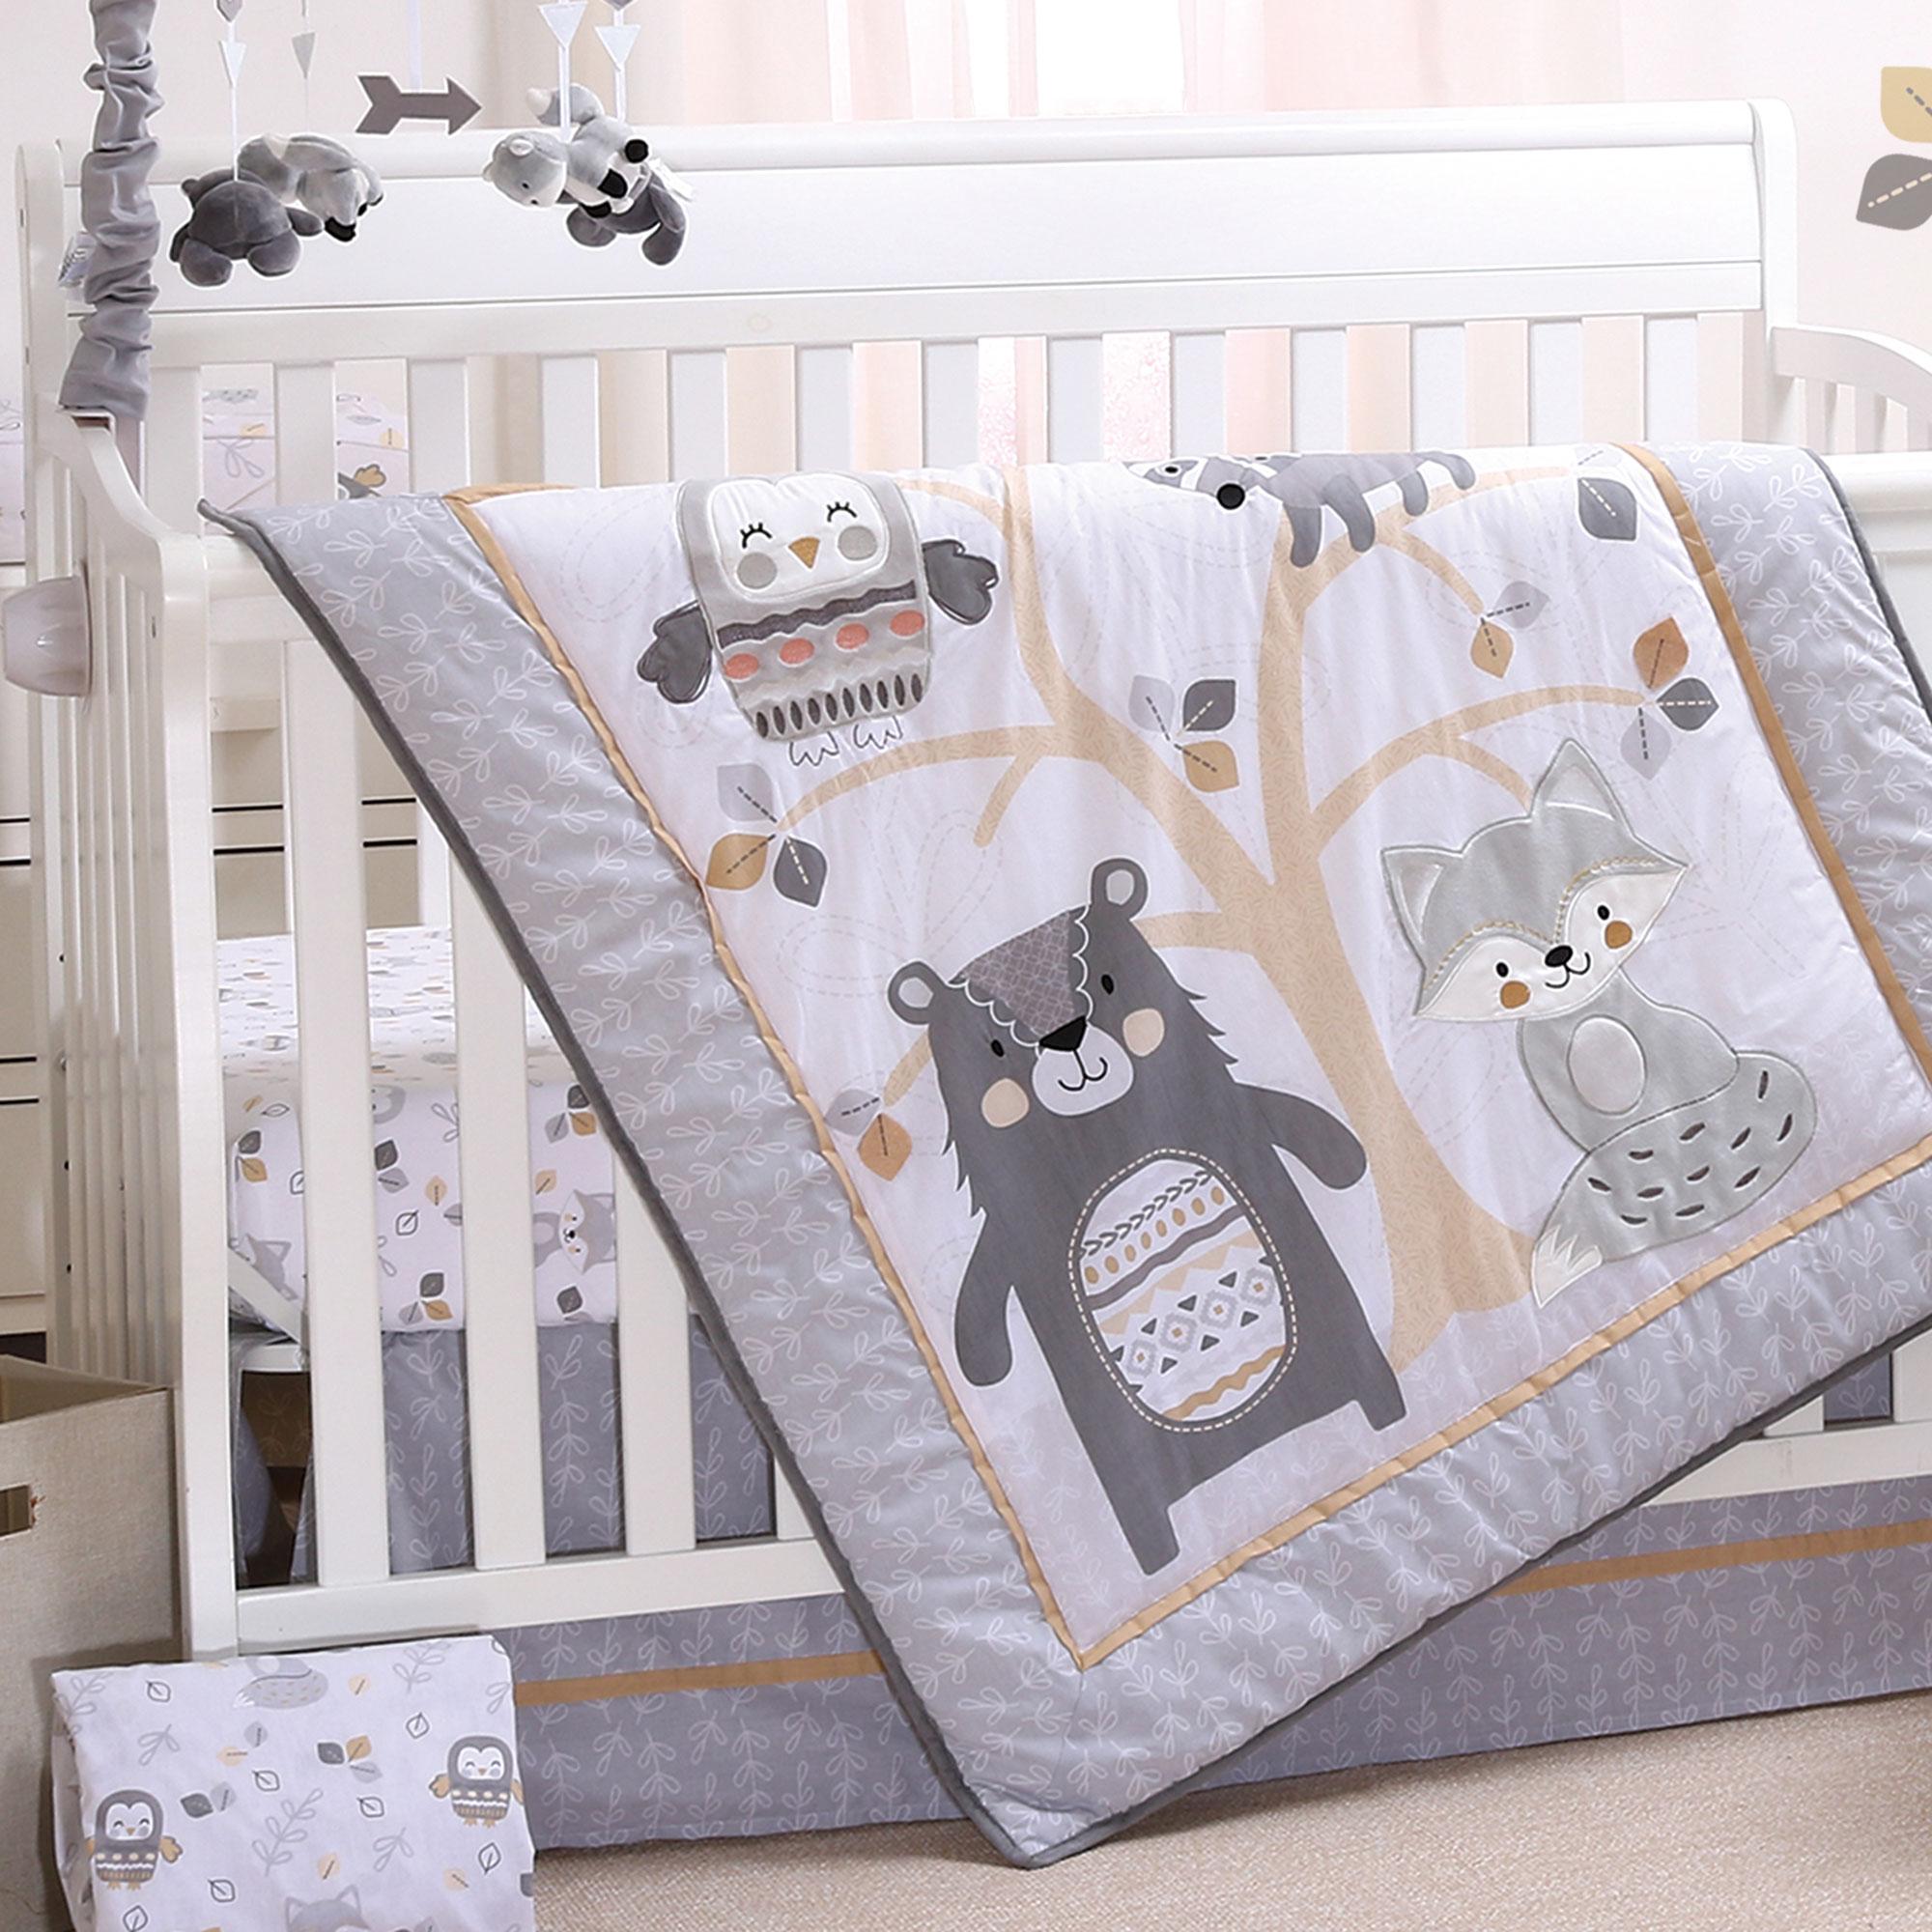 woodland friends 4 piece forest animal theme baby crib bedding set grey tan walmart com